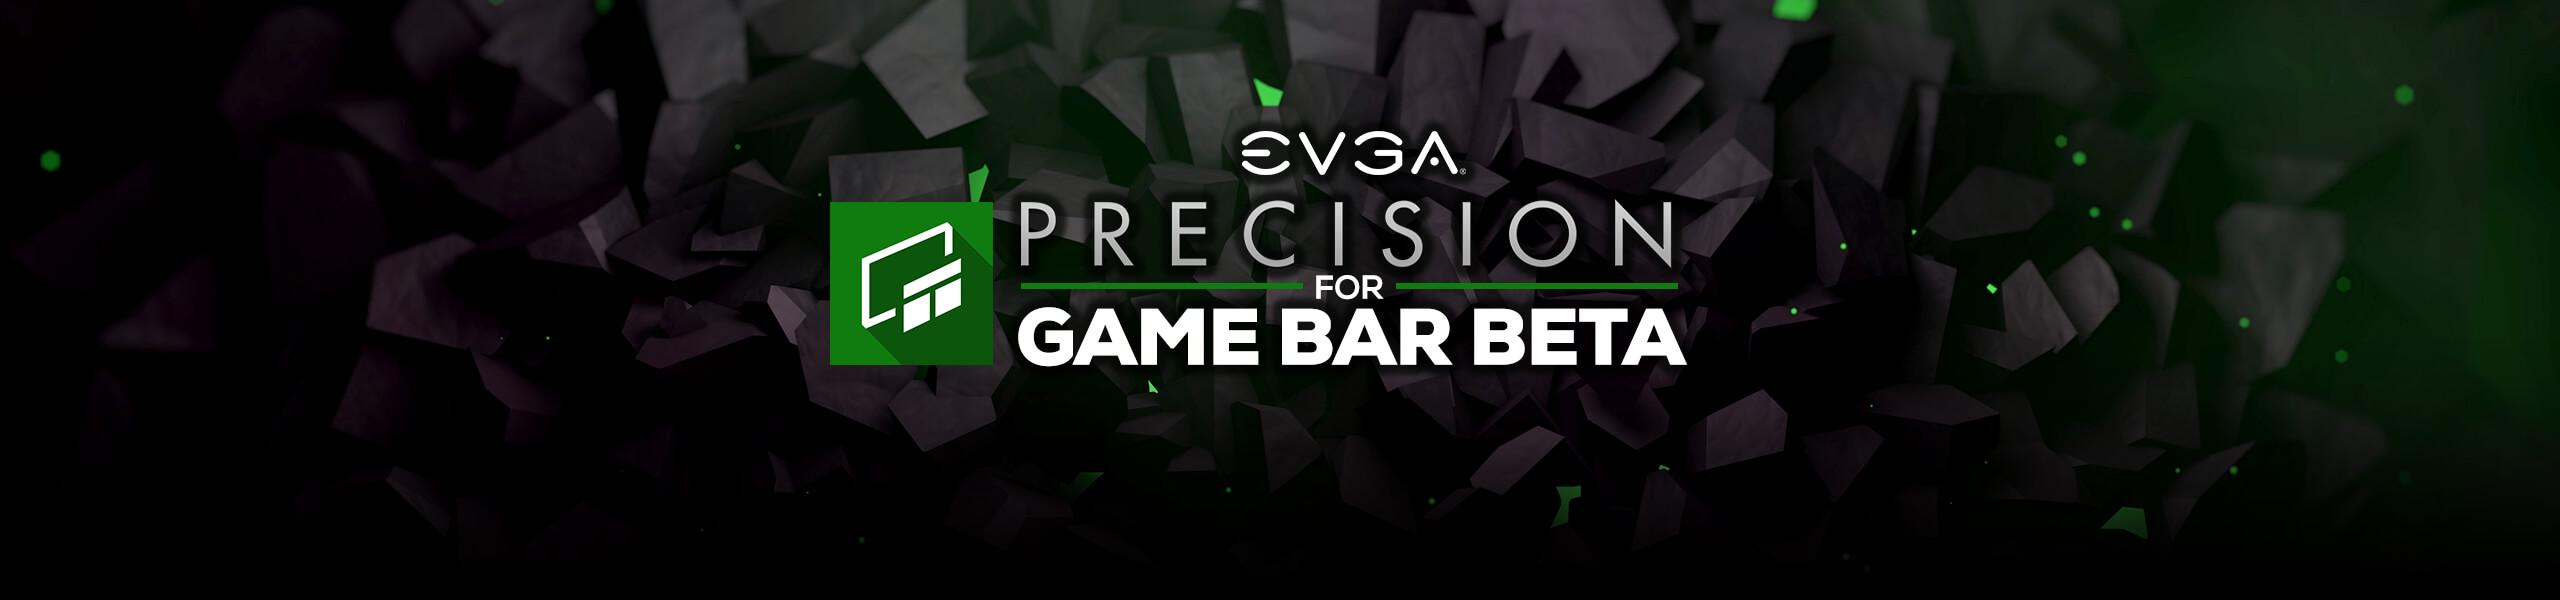 EVGA Precision for Game Bar